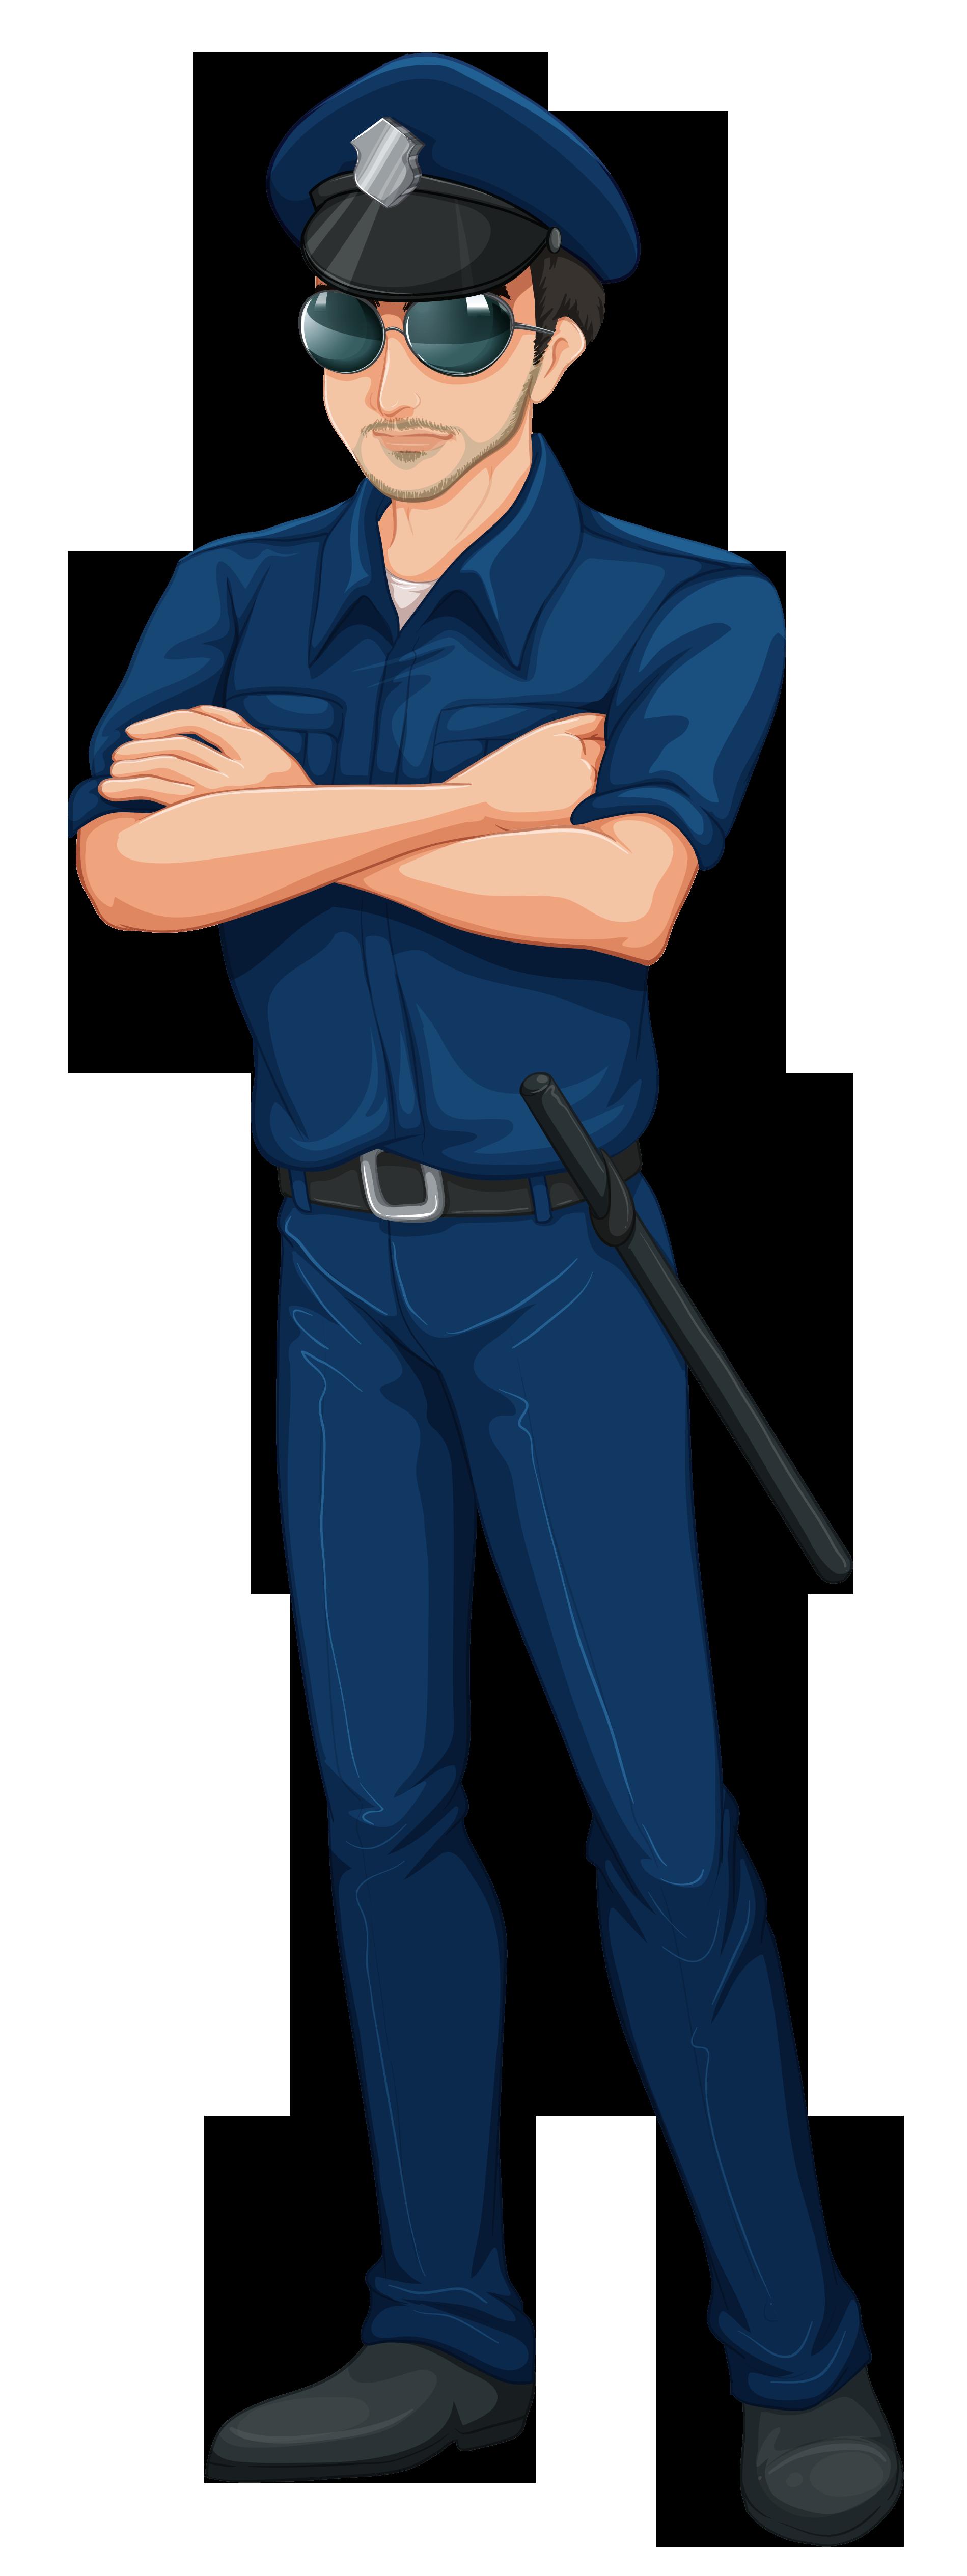 Cop Policeman PNG Clip Art Image